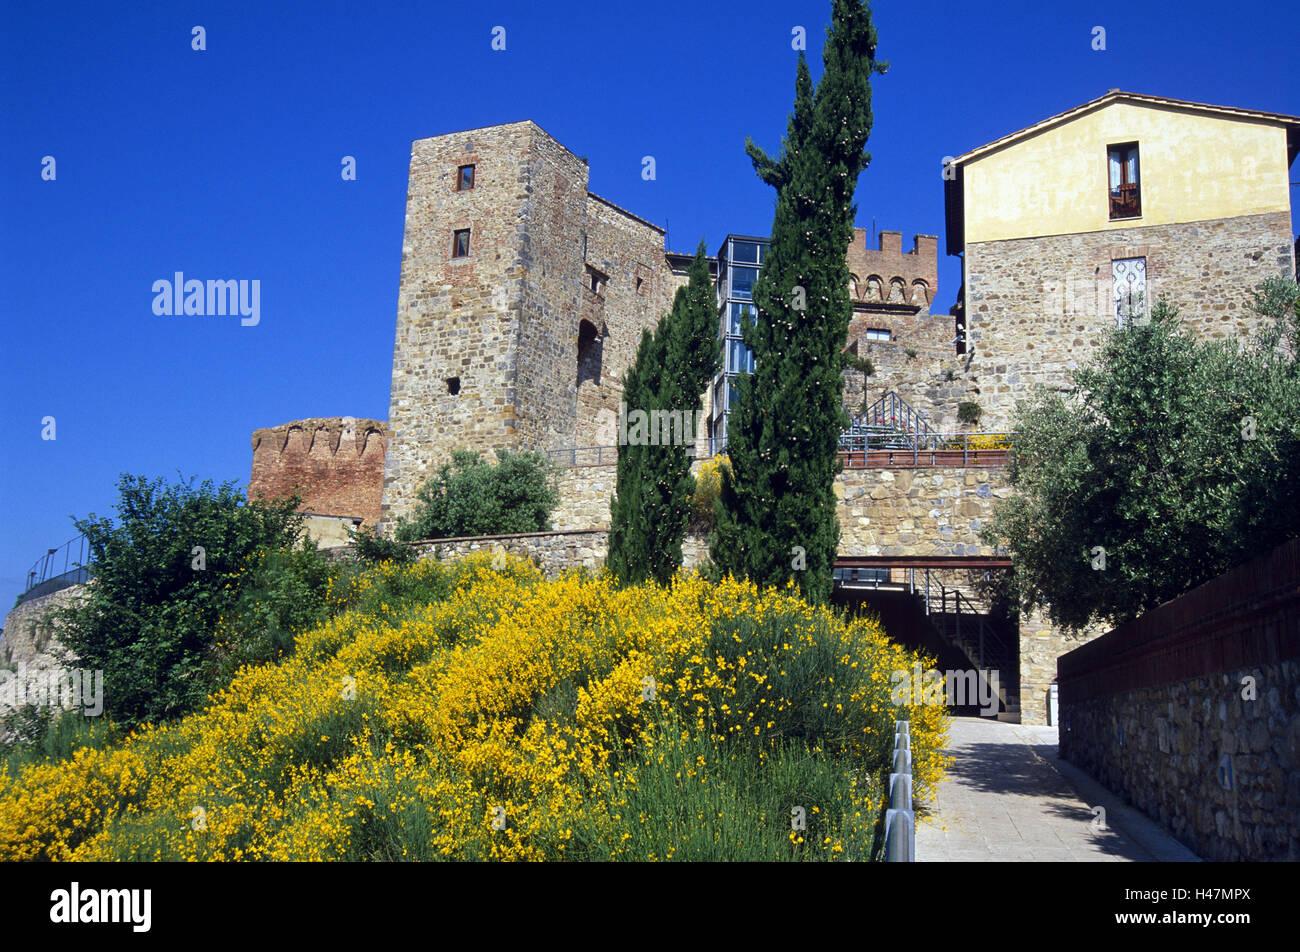 Italy, Tuscany, Casole d'Elsa, fortress, broom, fortress